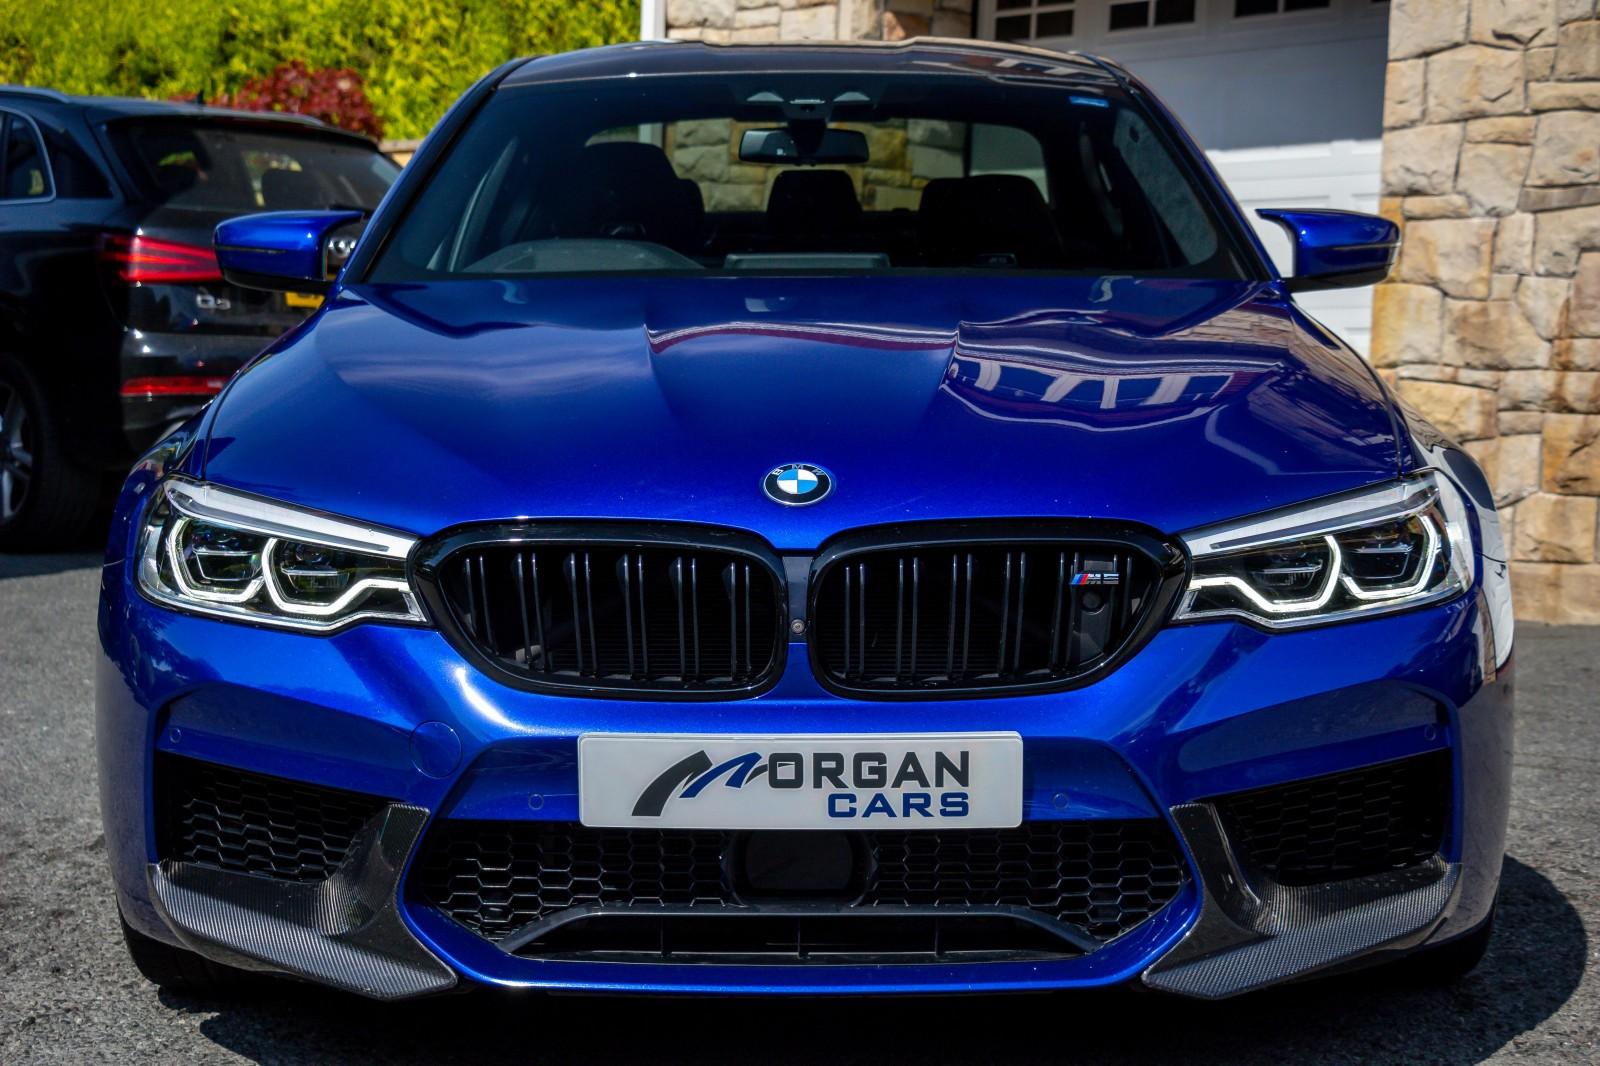 2018 BMW M5 M5 Petrol Automatic – Morgan Cars 9 Mound Road, Warrenpoint, Newry BT34 3LW, UK full